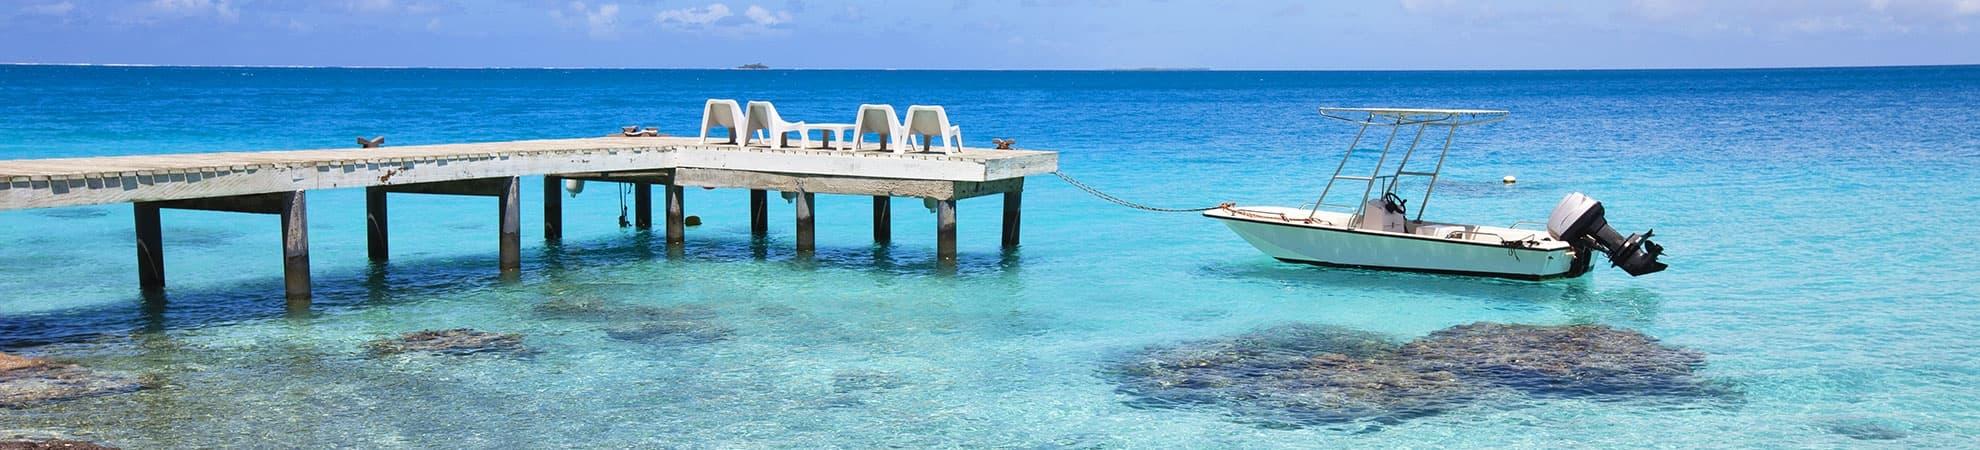 Voyage Iles Fidji